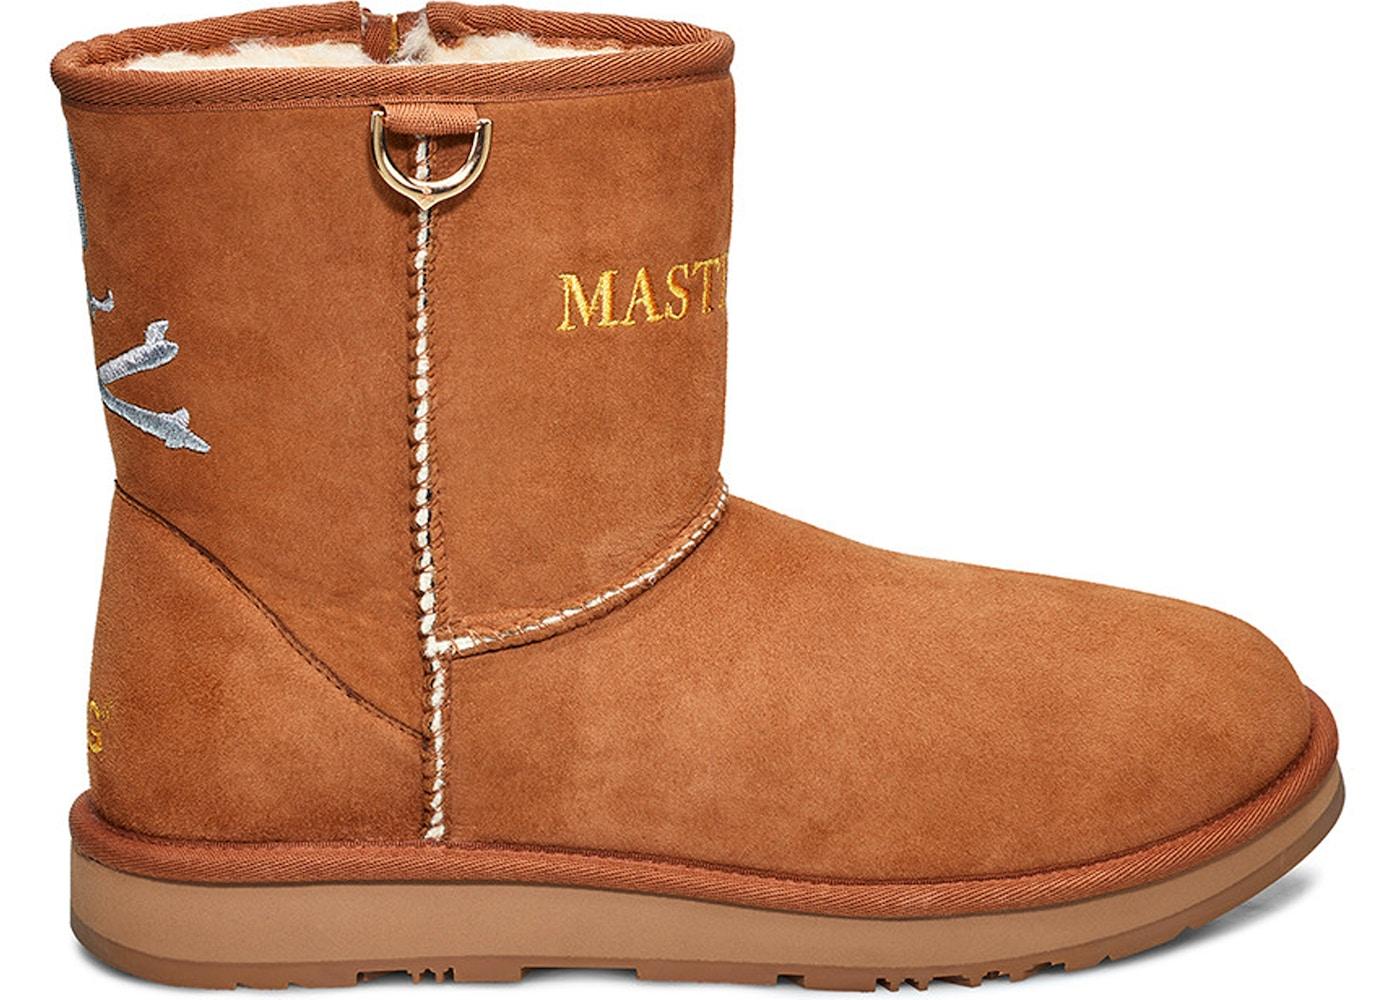 1fb8674b6c59 UGG Classic Short Boot mastermind World Chestnut - TBD